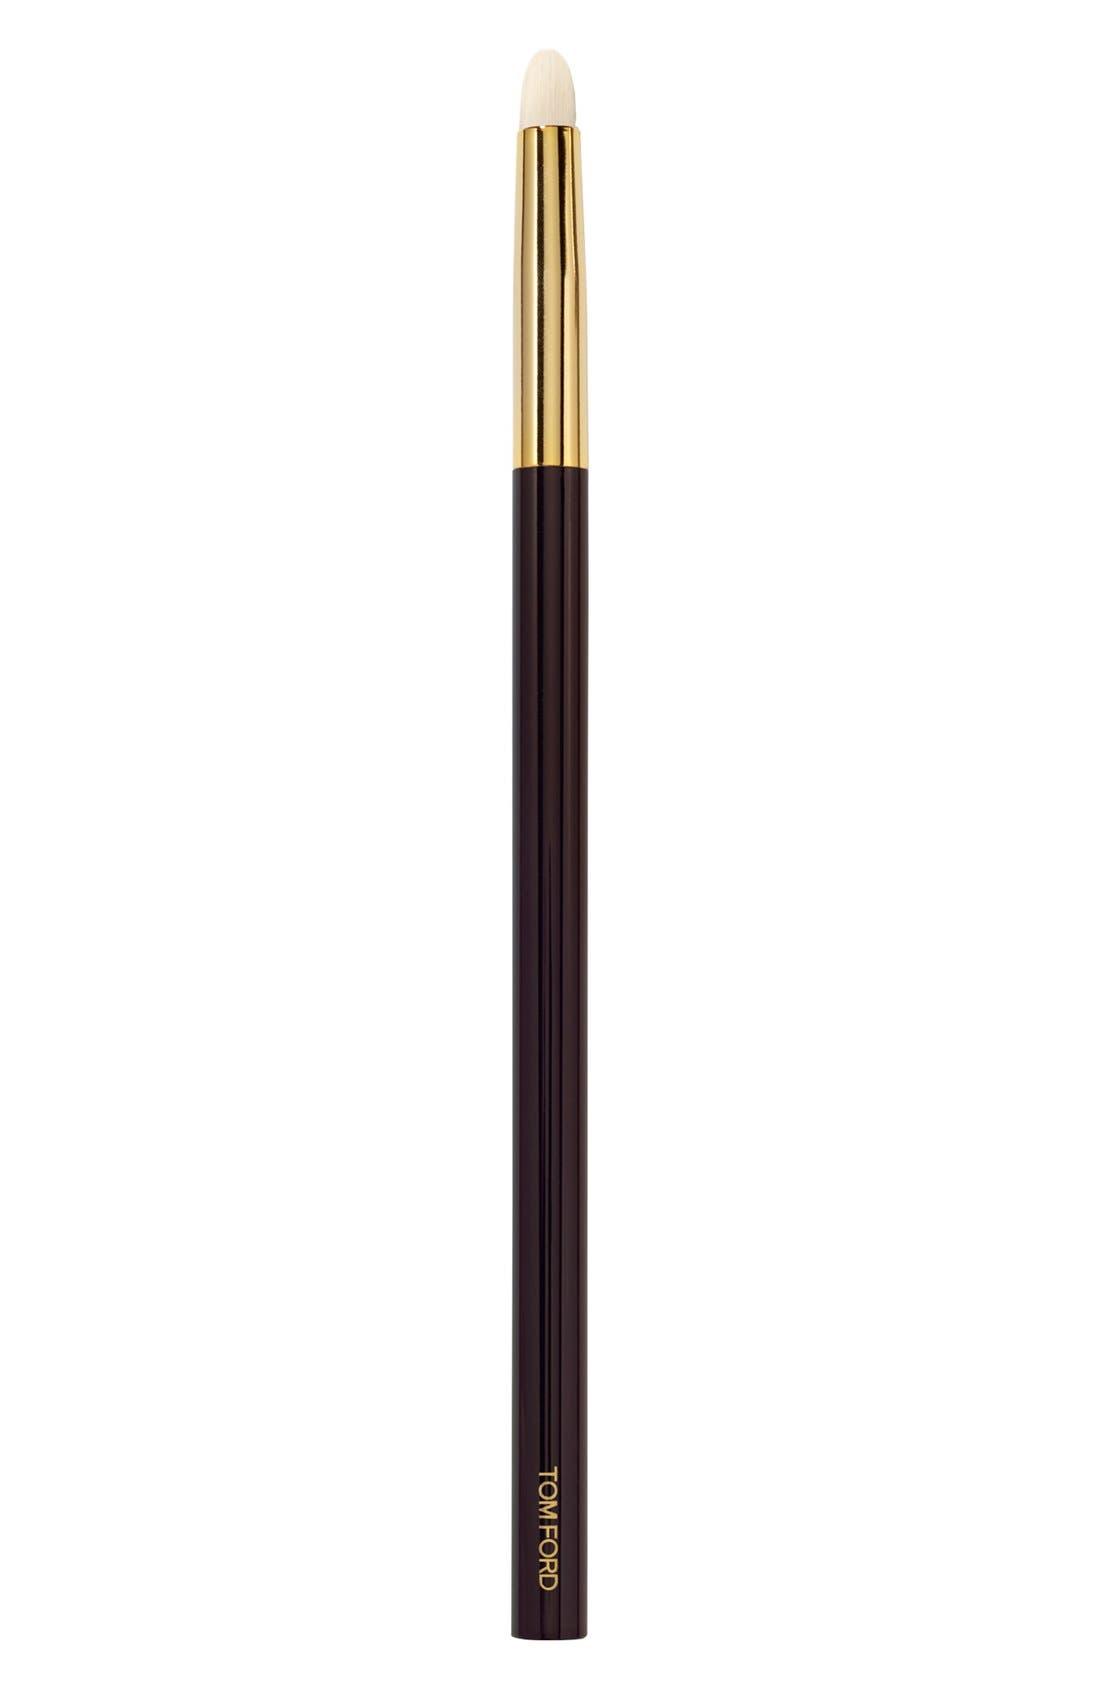 Smoky Eye Brush 14,                         Main,                         color, 000